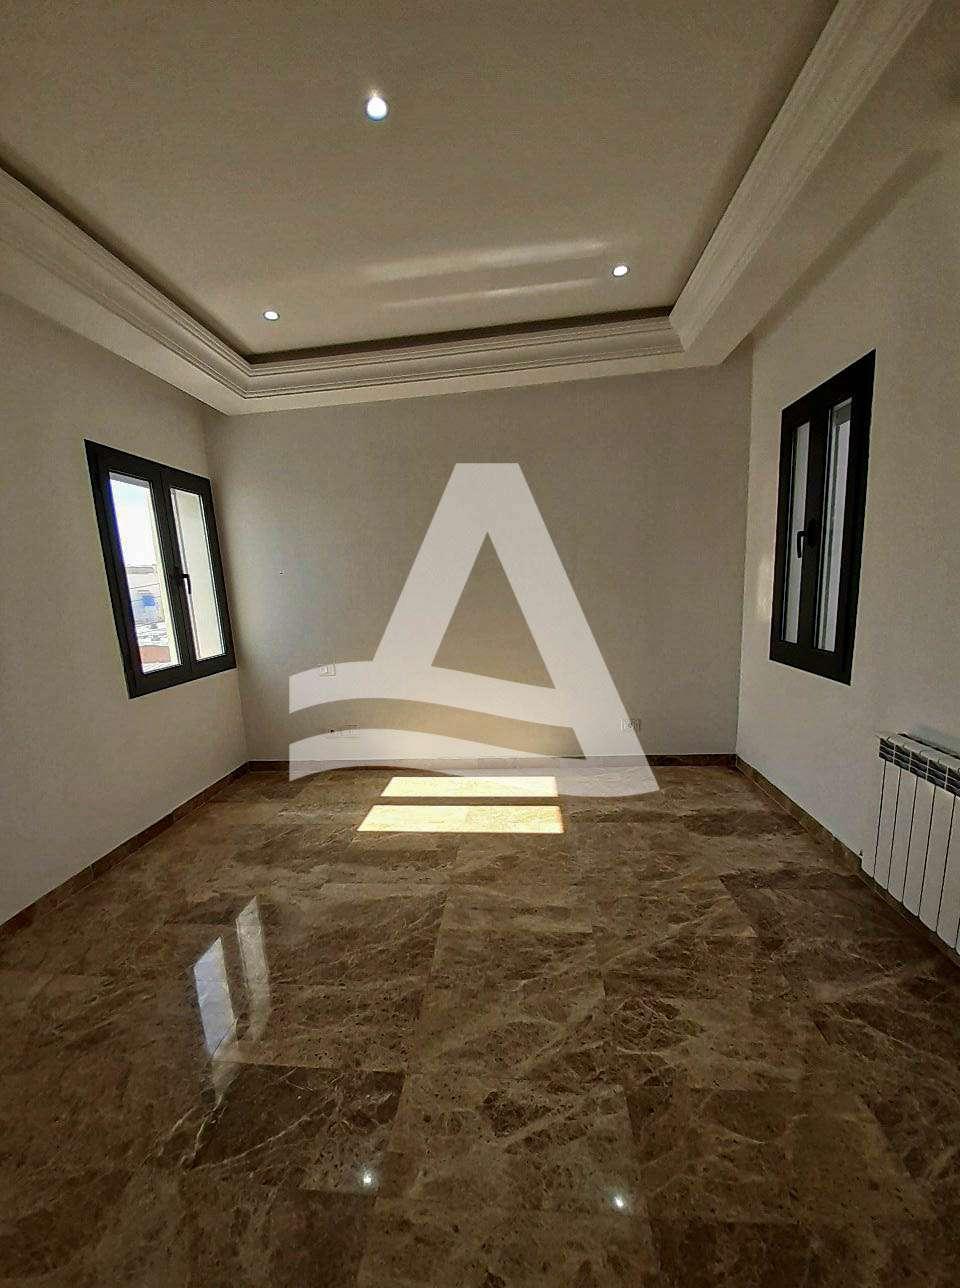 httpss3.amazonaws.comlogimoaws1853152441617293093Appartement_Marsa_Tunisie_-8-1